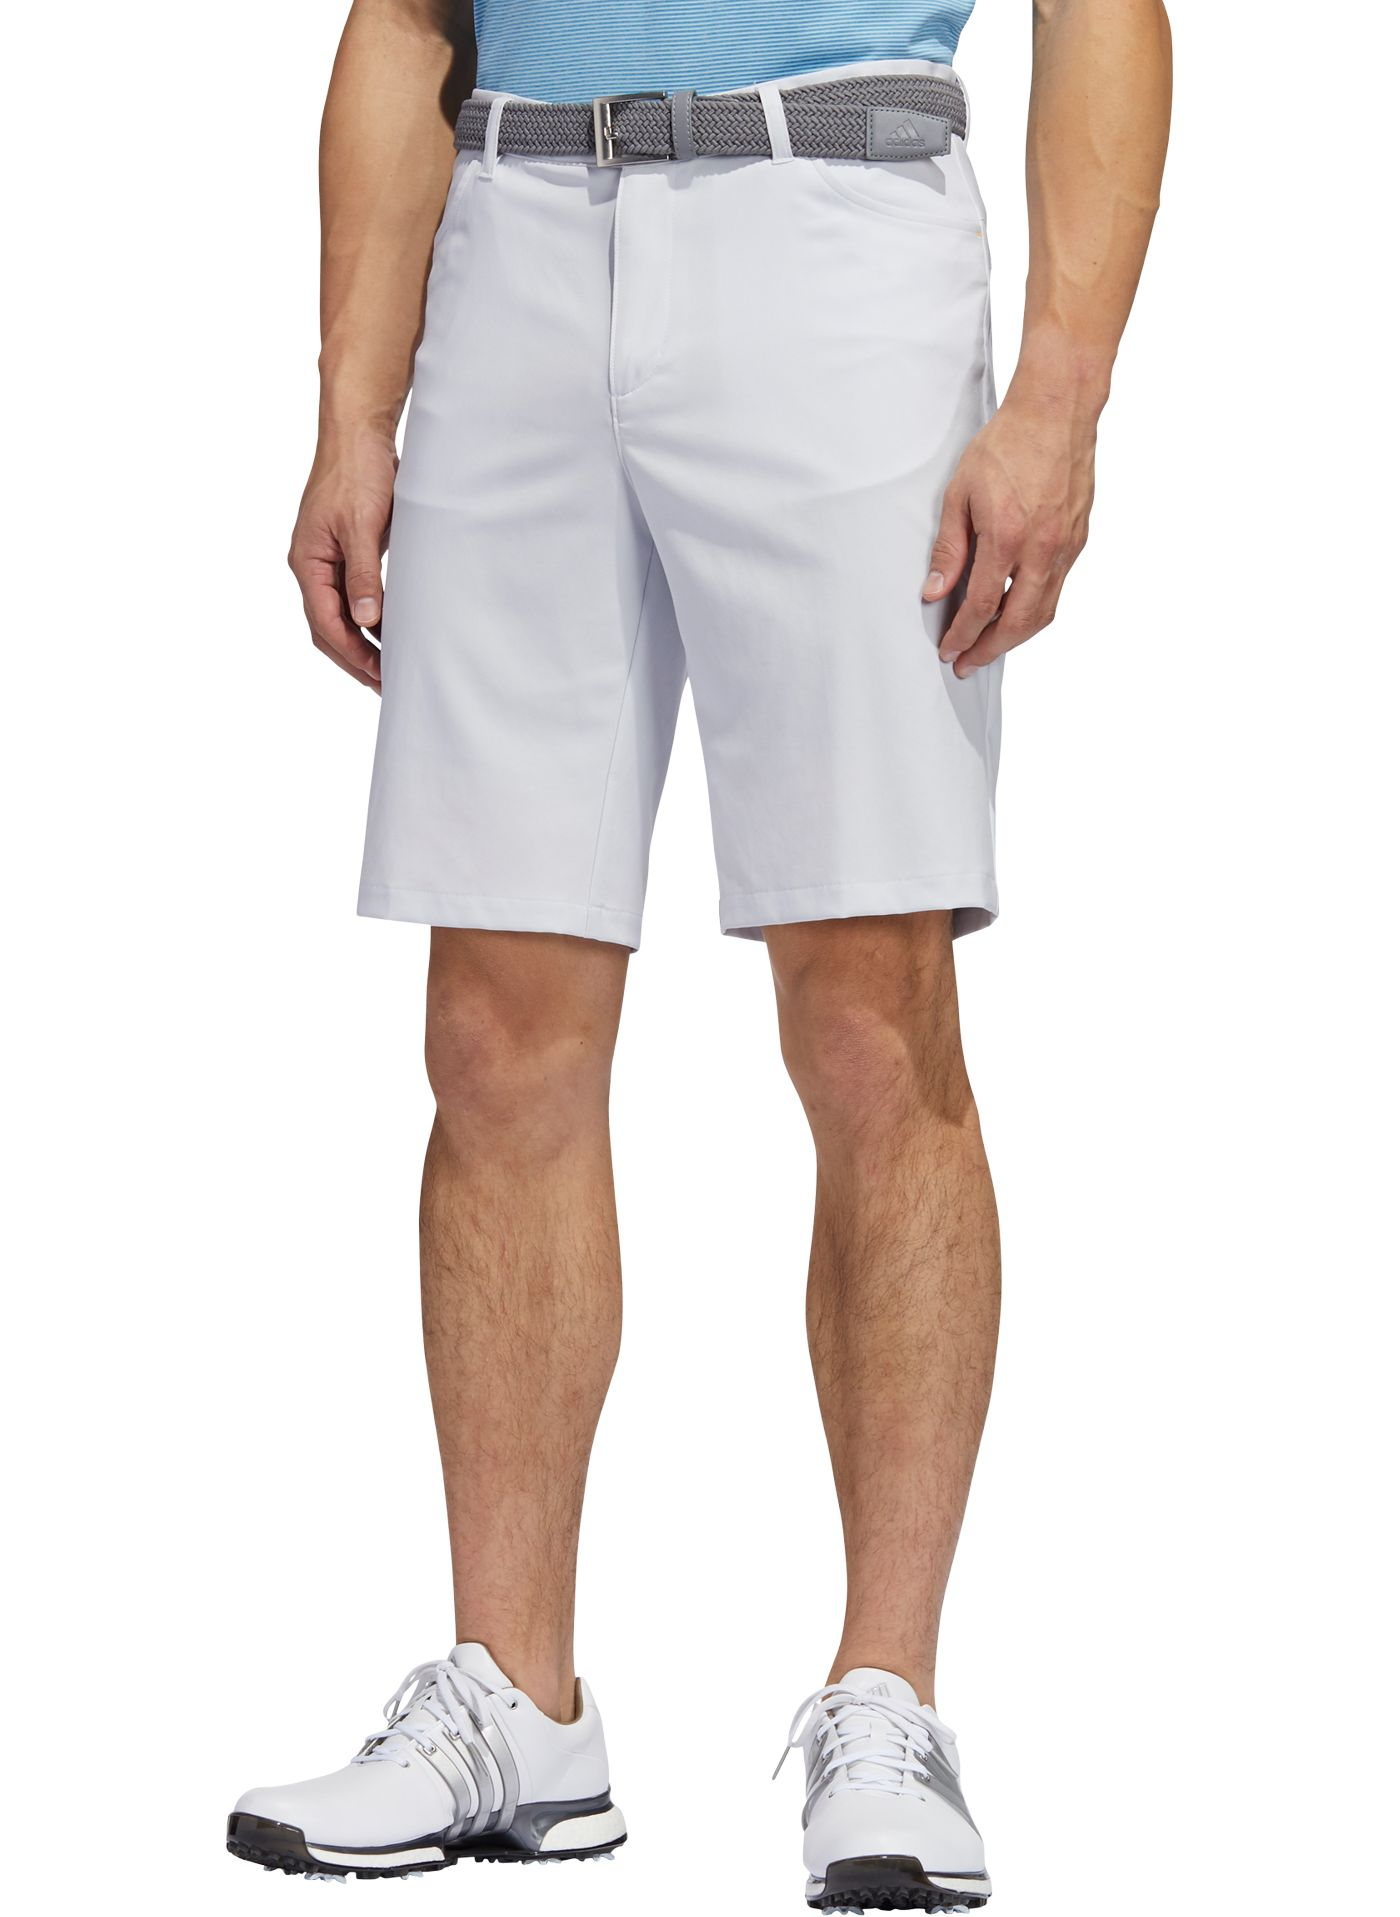 adidas Men's Primeblue Golf Shorts